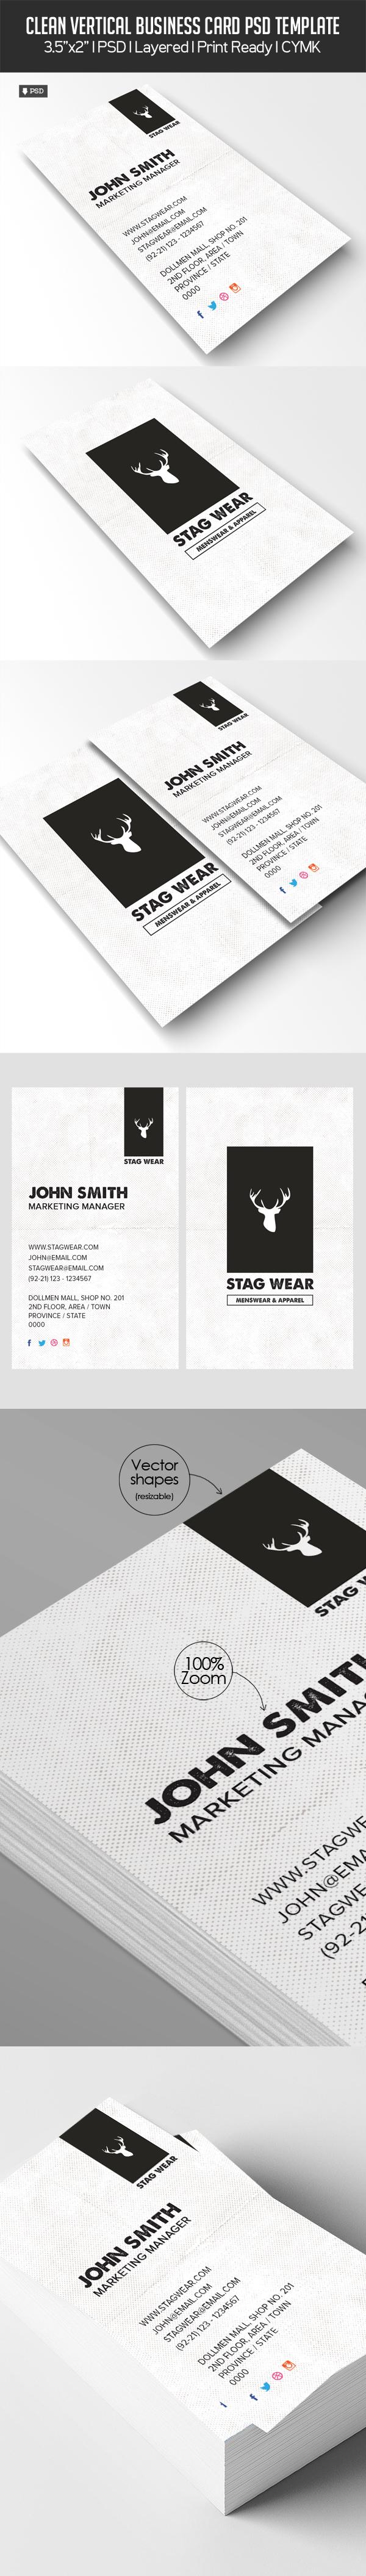 Freebie - Vertical Business Card PSD Template